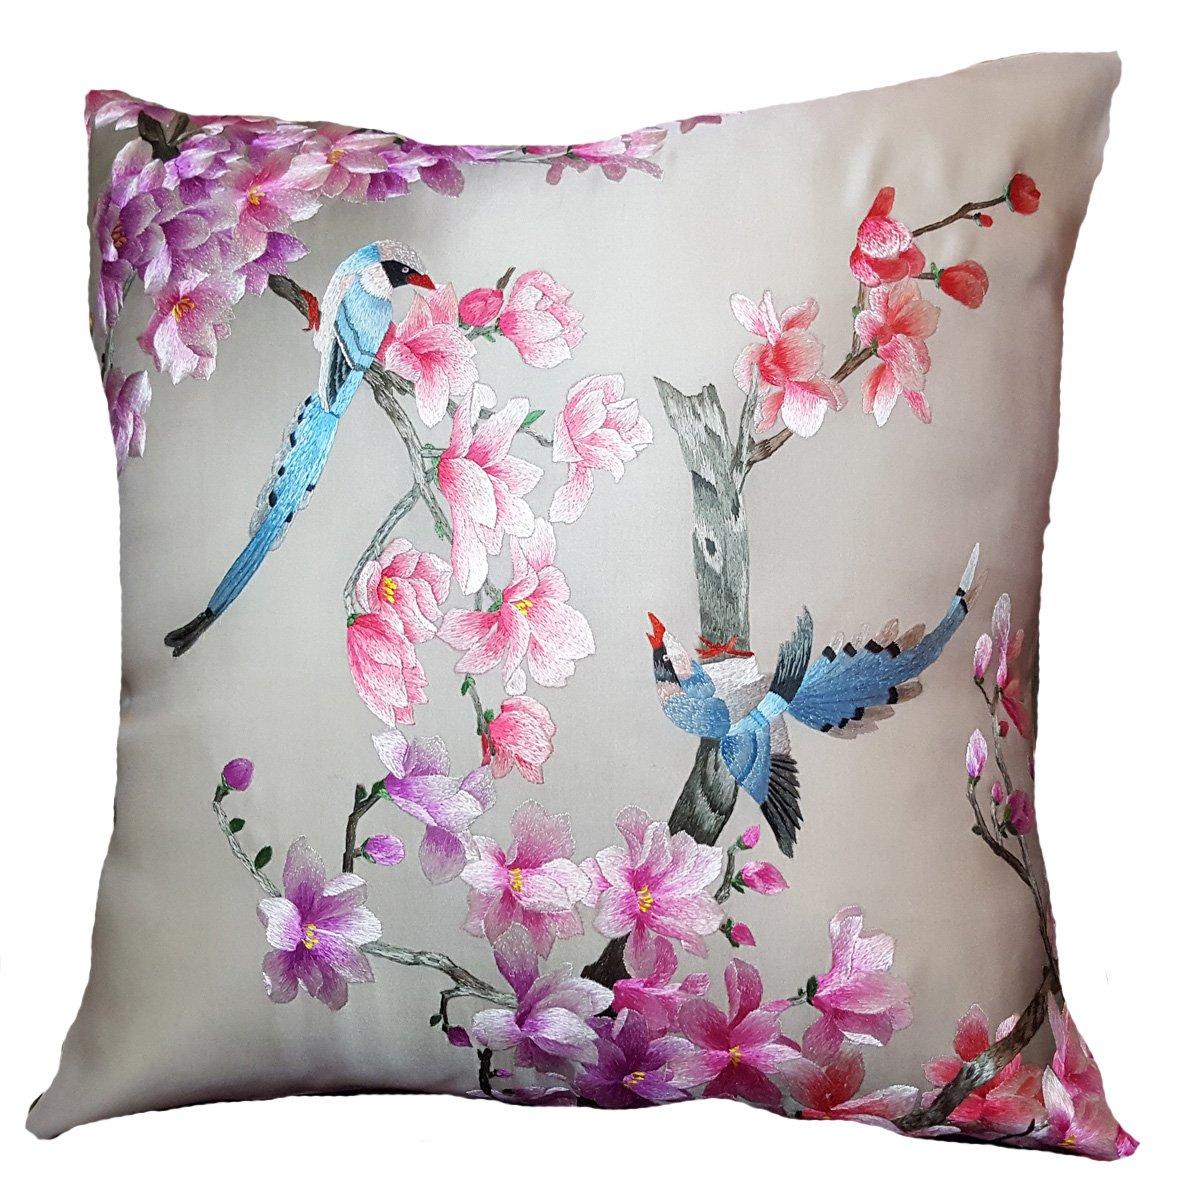 Blues inピンク – シルク刺繍装飾枕 – 20